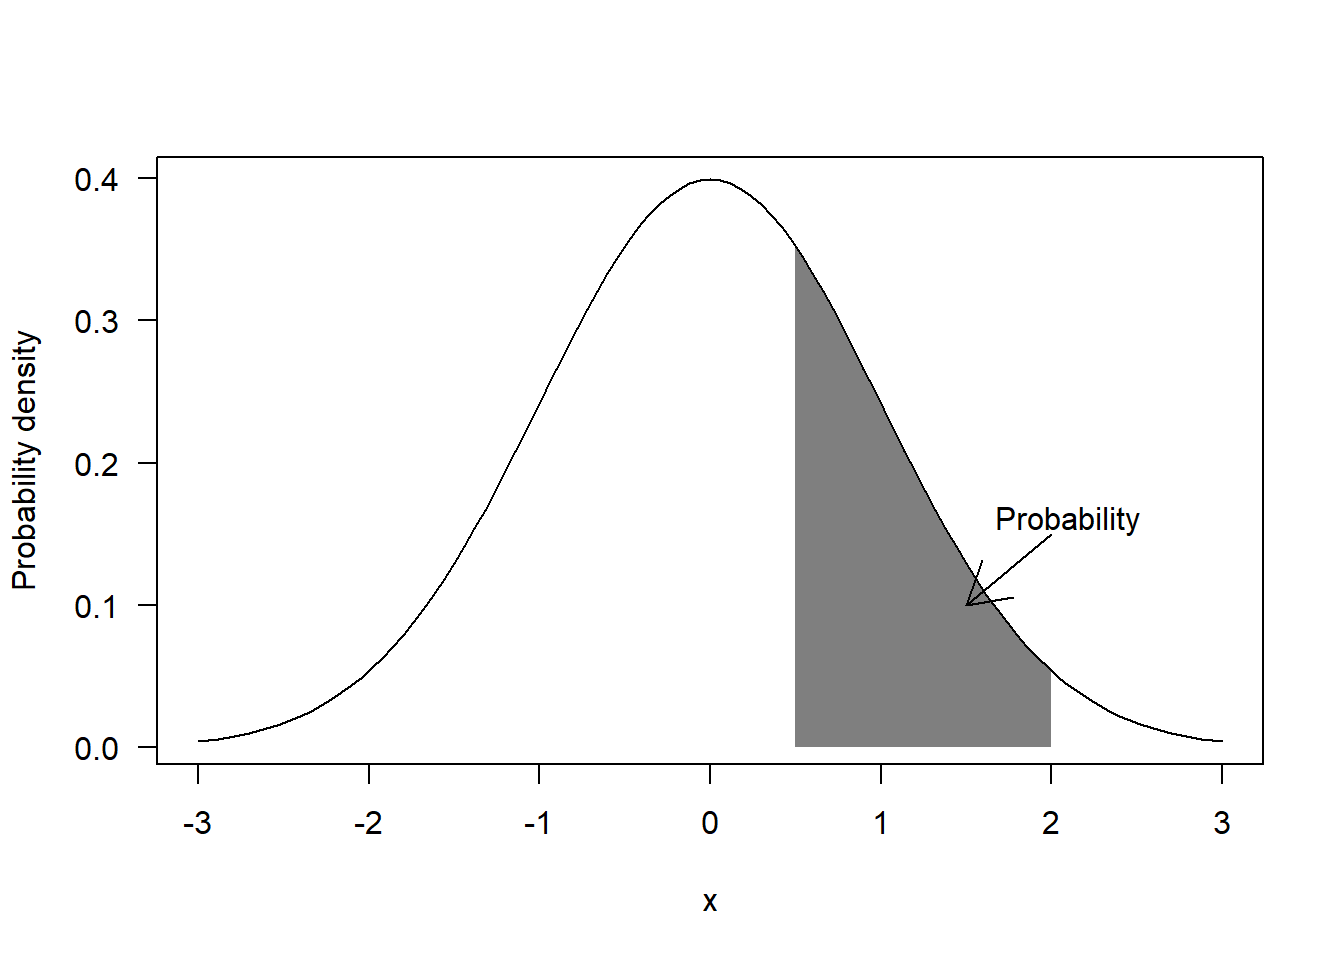 Maximum likelihood estimation from scratch